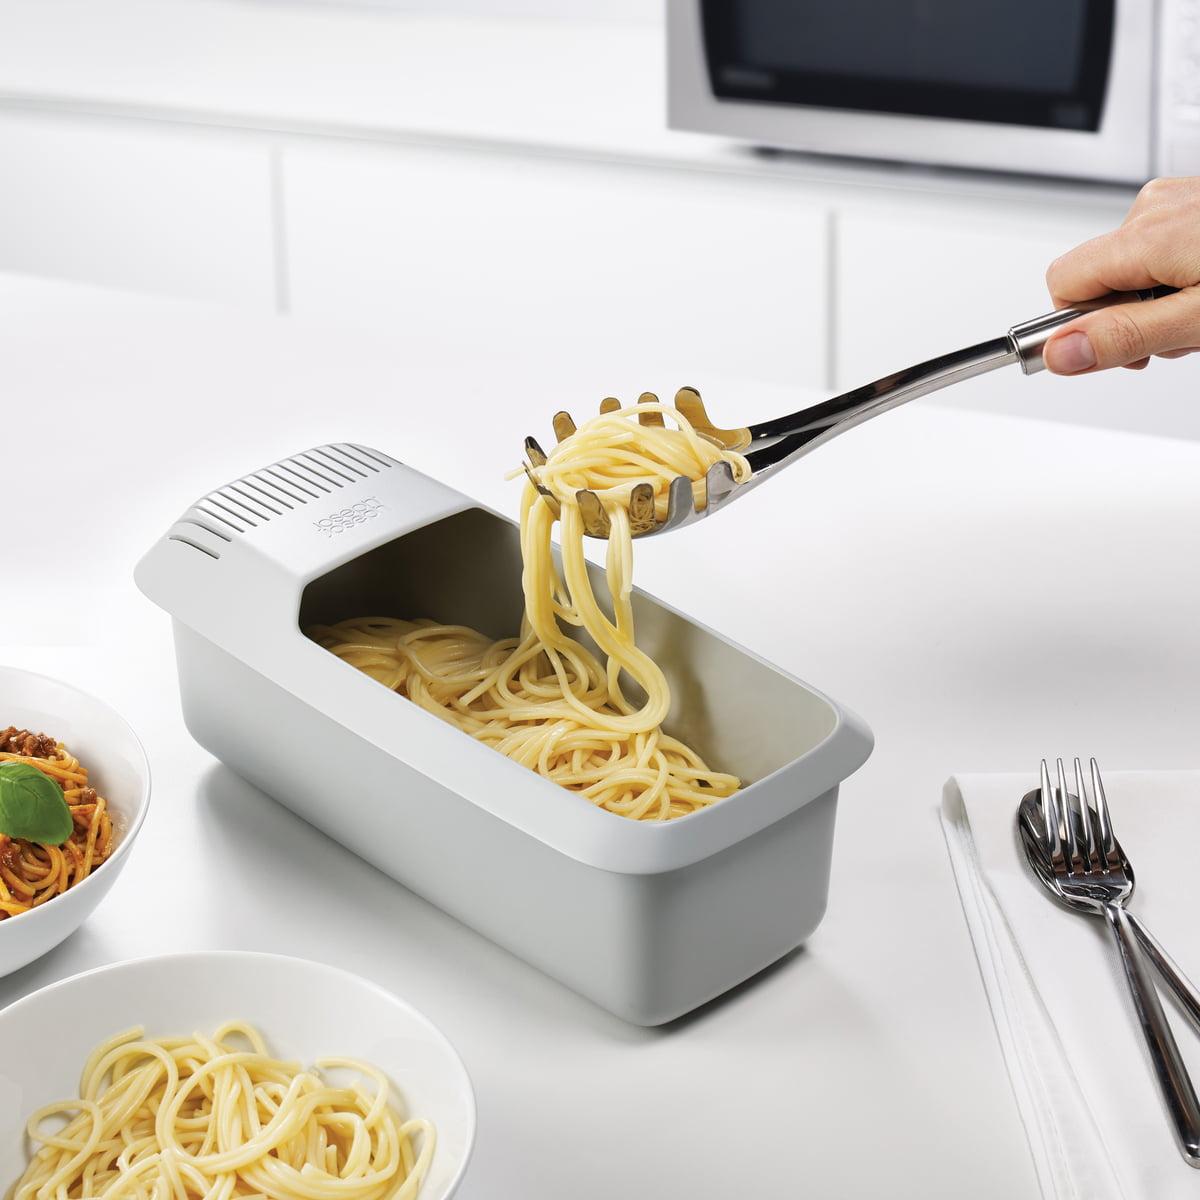 Joseph joseph m cuisine microwave pasta cooker - Joseph joseph cuisine ...